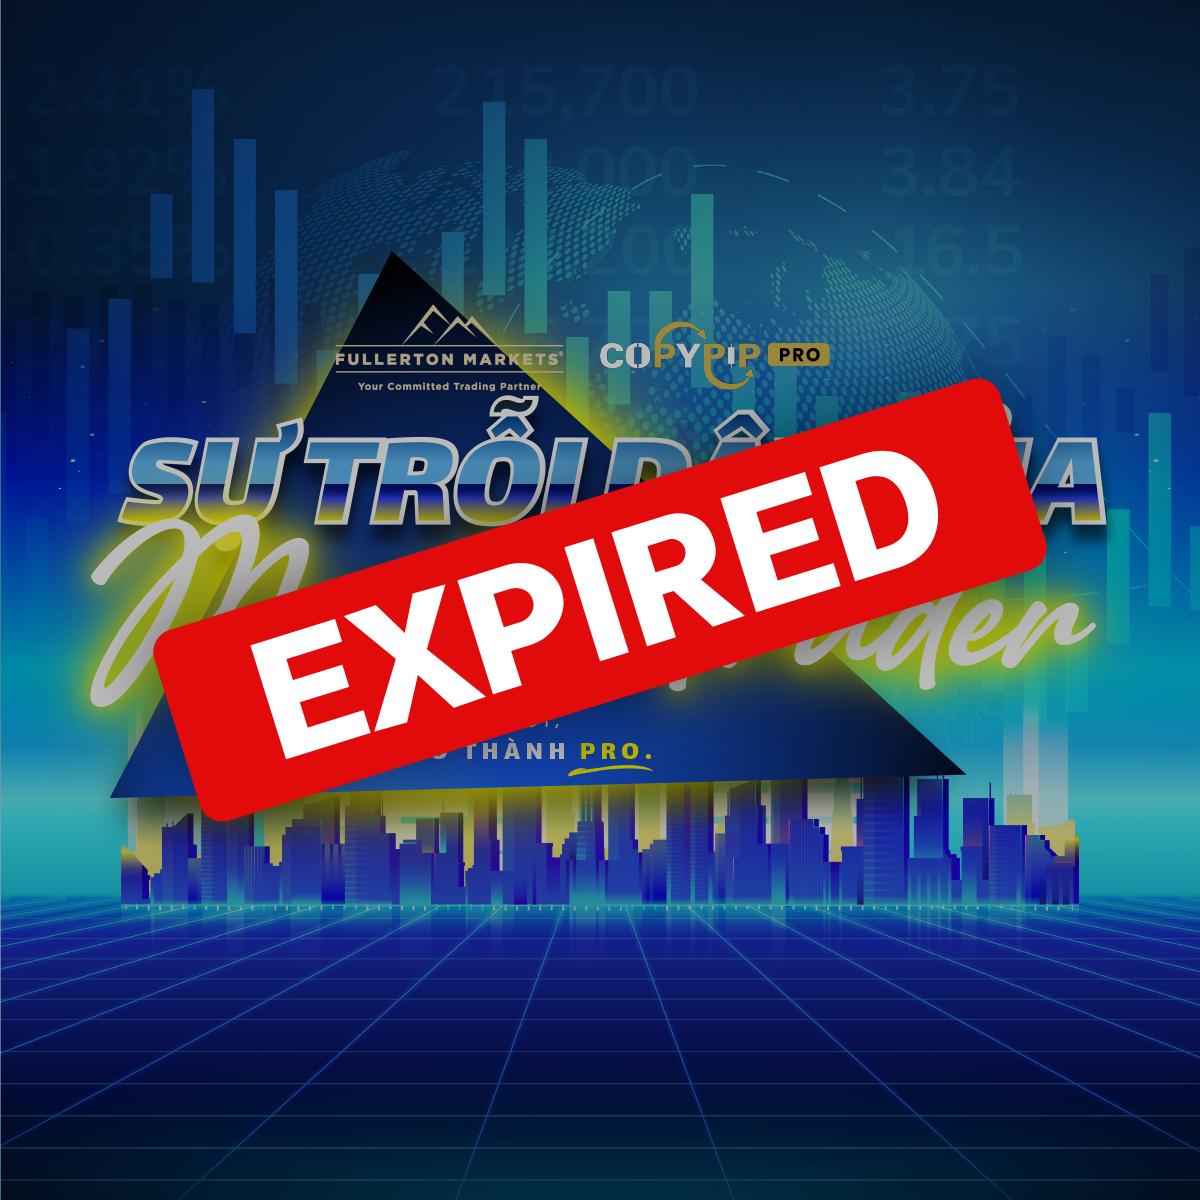 CopyPip-Pro-Trading-Contest_1200x1200px_vn